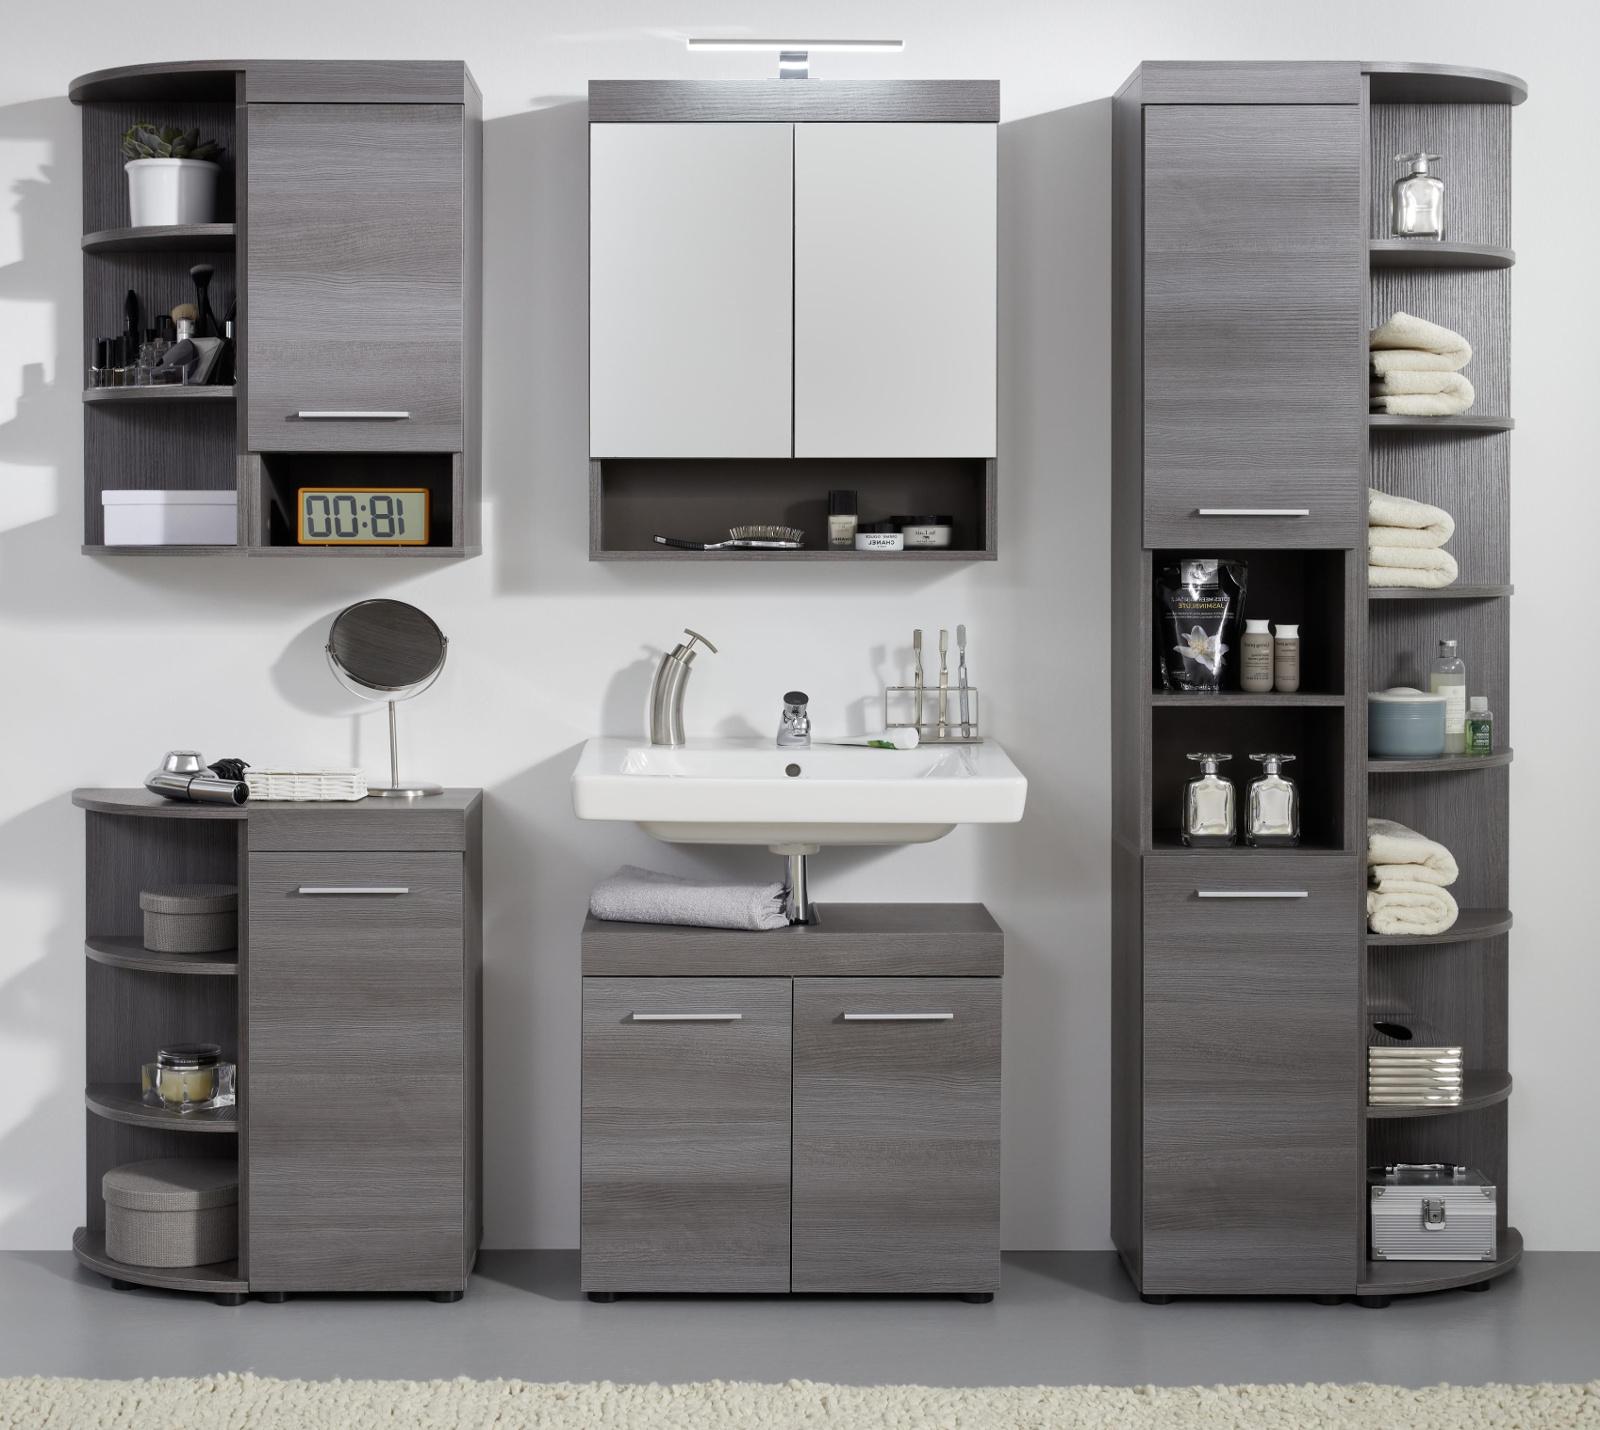 bartresen alle ideen ber home design. Black Bedroom Furniture Sets. Home Design Ideas